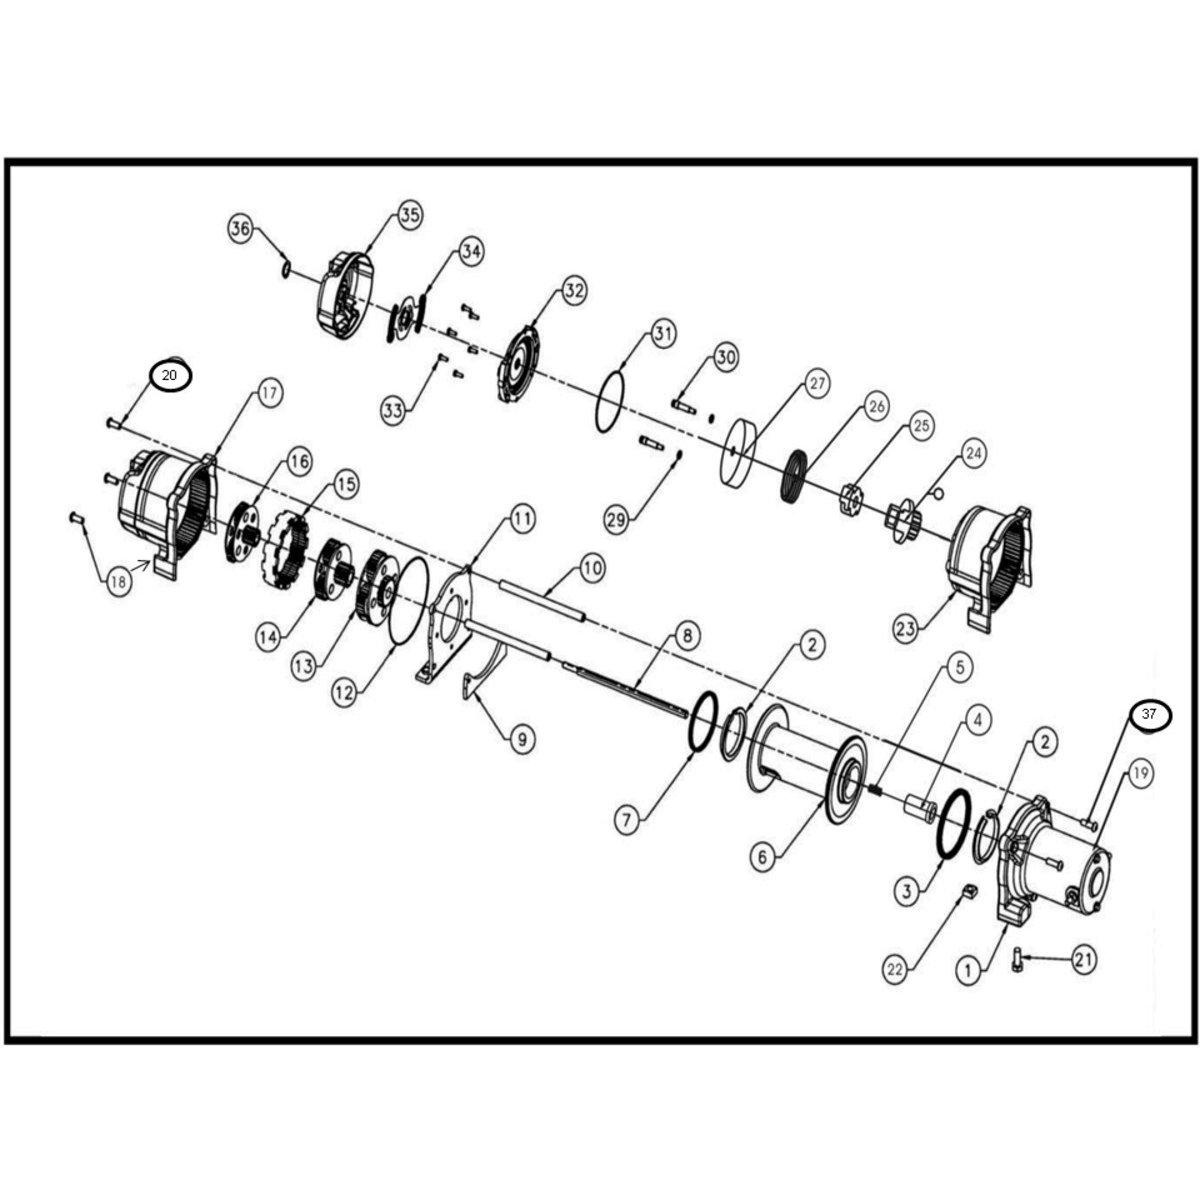 Polaris 4500 Winch Parts Diagram Free Wiring Diagram For You